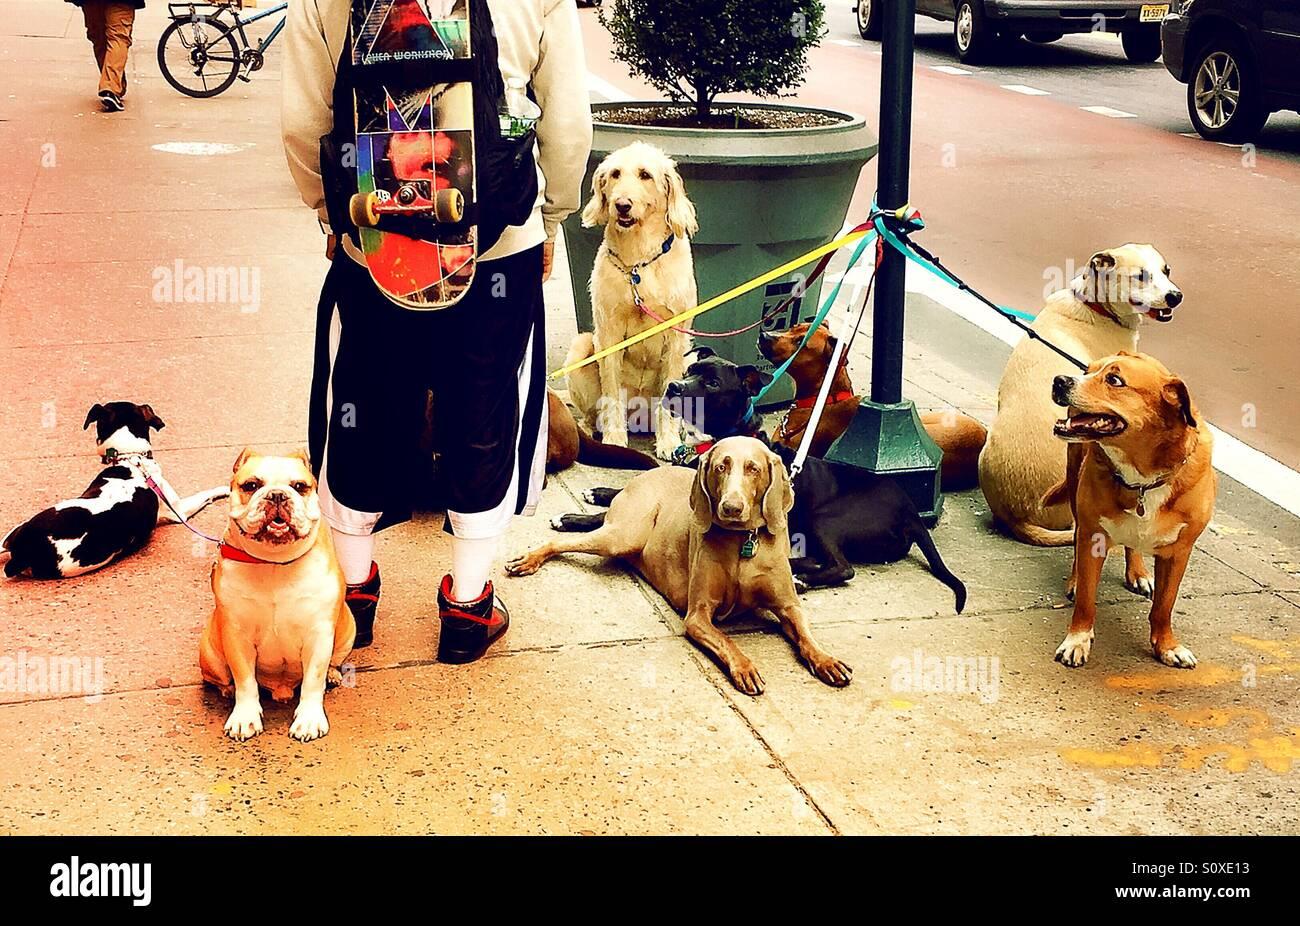 Dog walker in New York City, USA Stock Photo